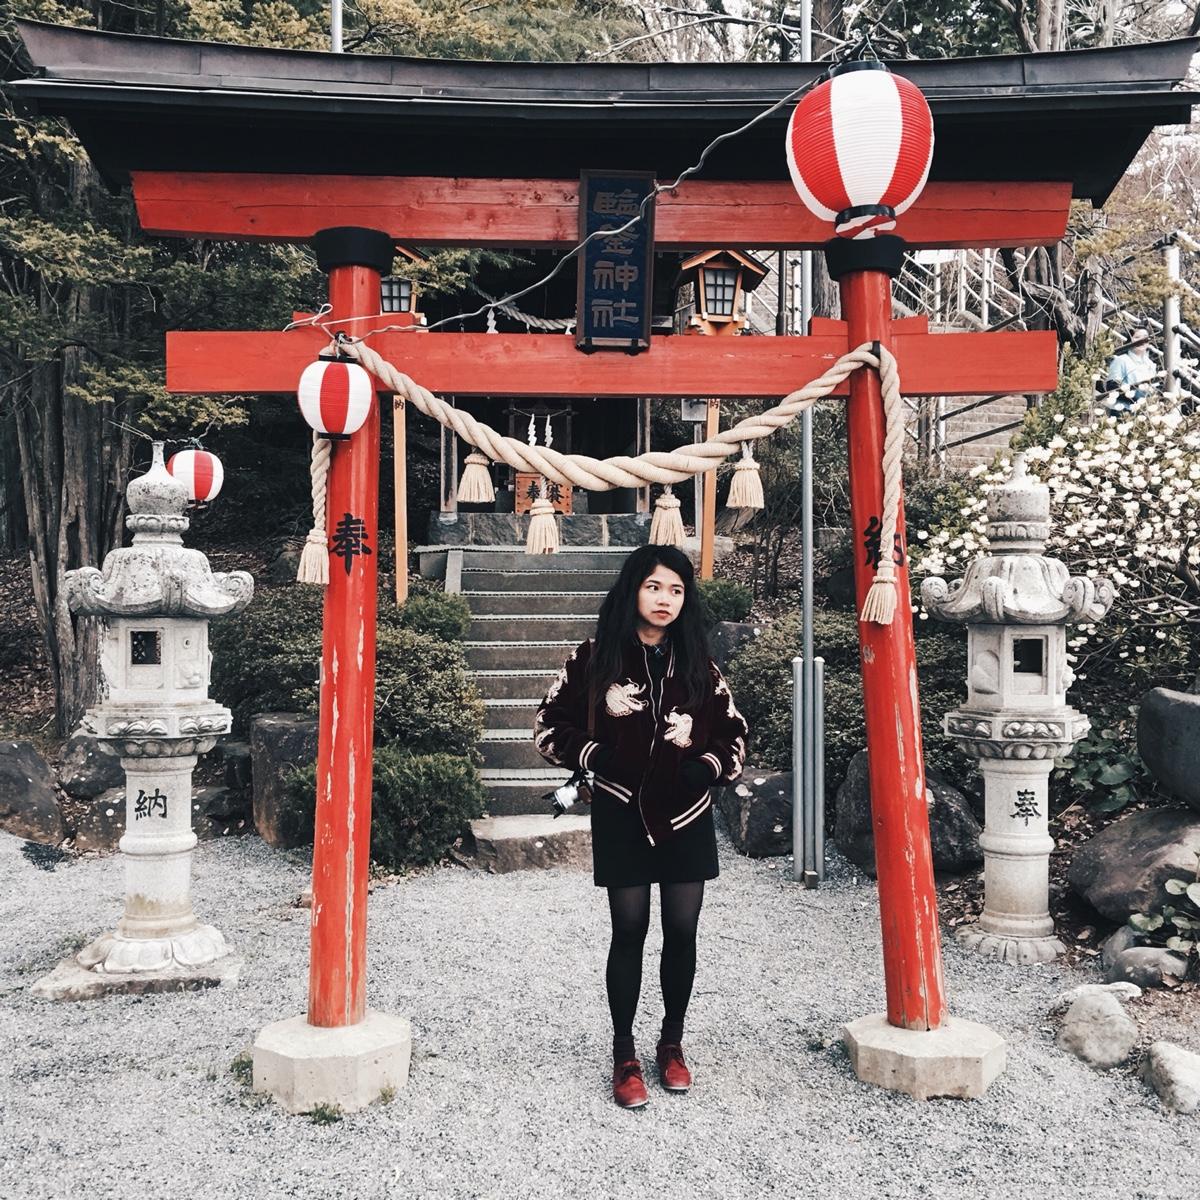 pagoda-mt-fuji.jpg